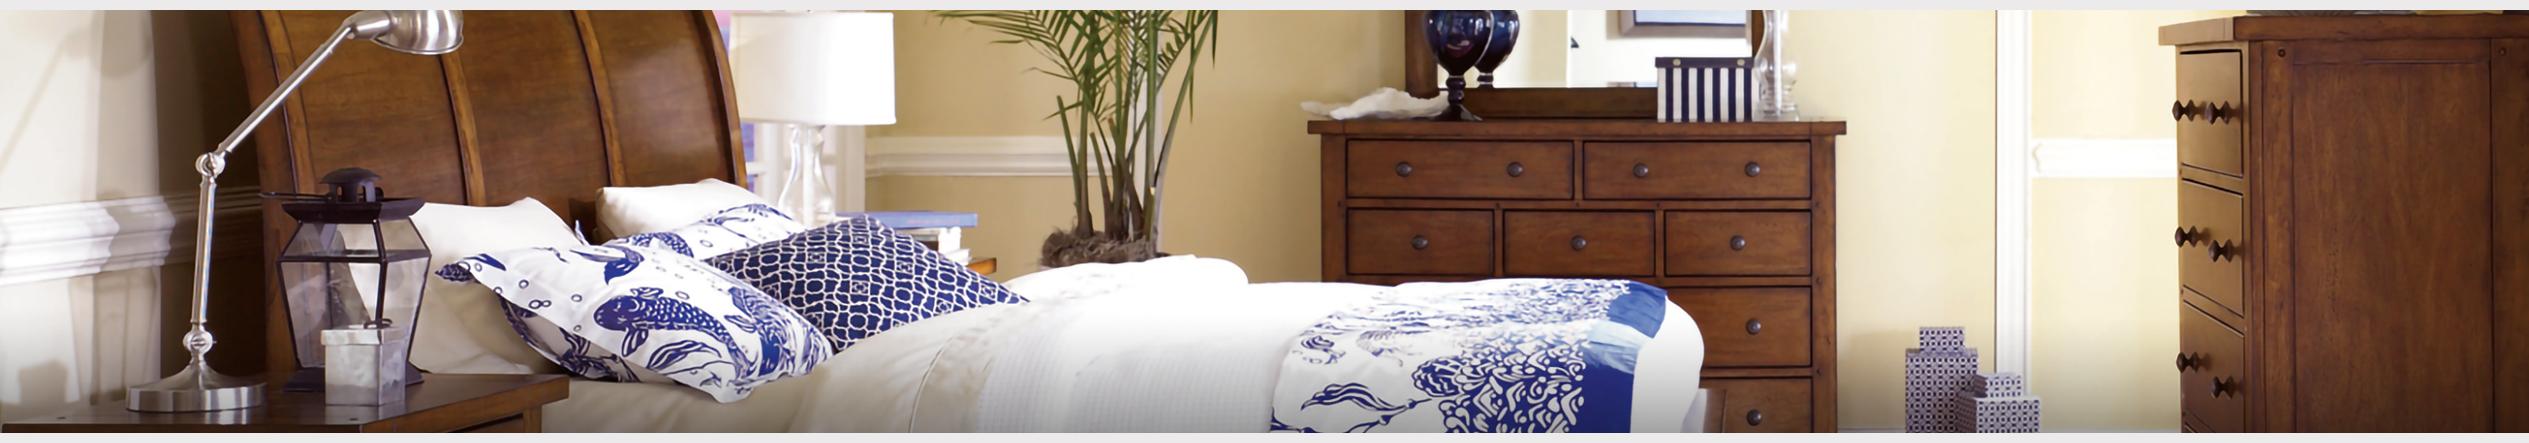 Wood Furniture care tips from Jordan\'s Furniture